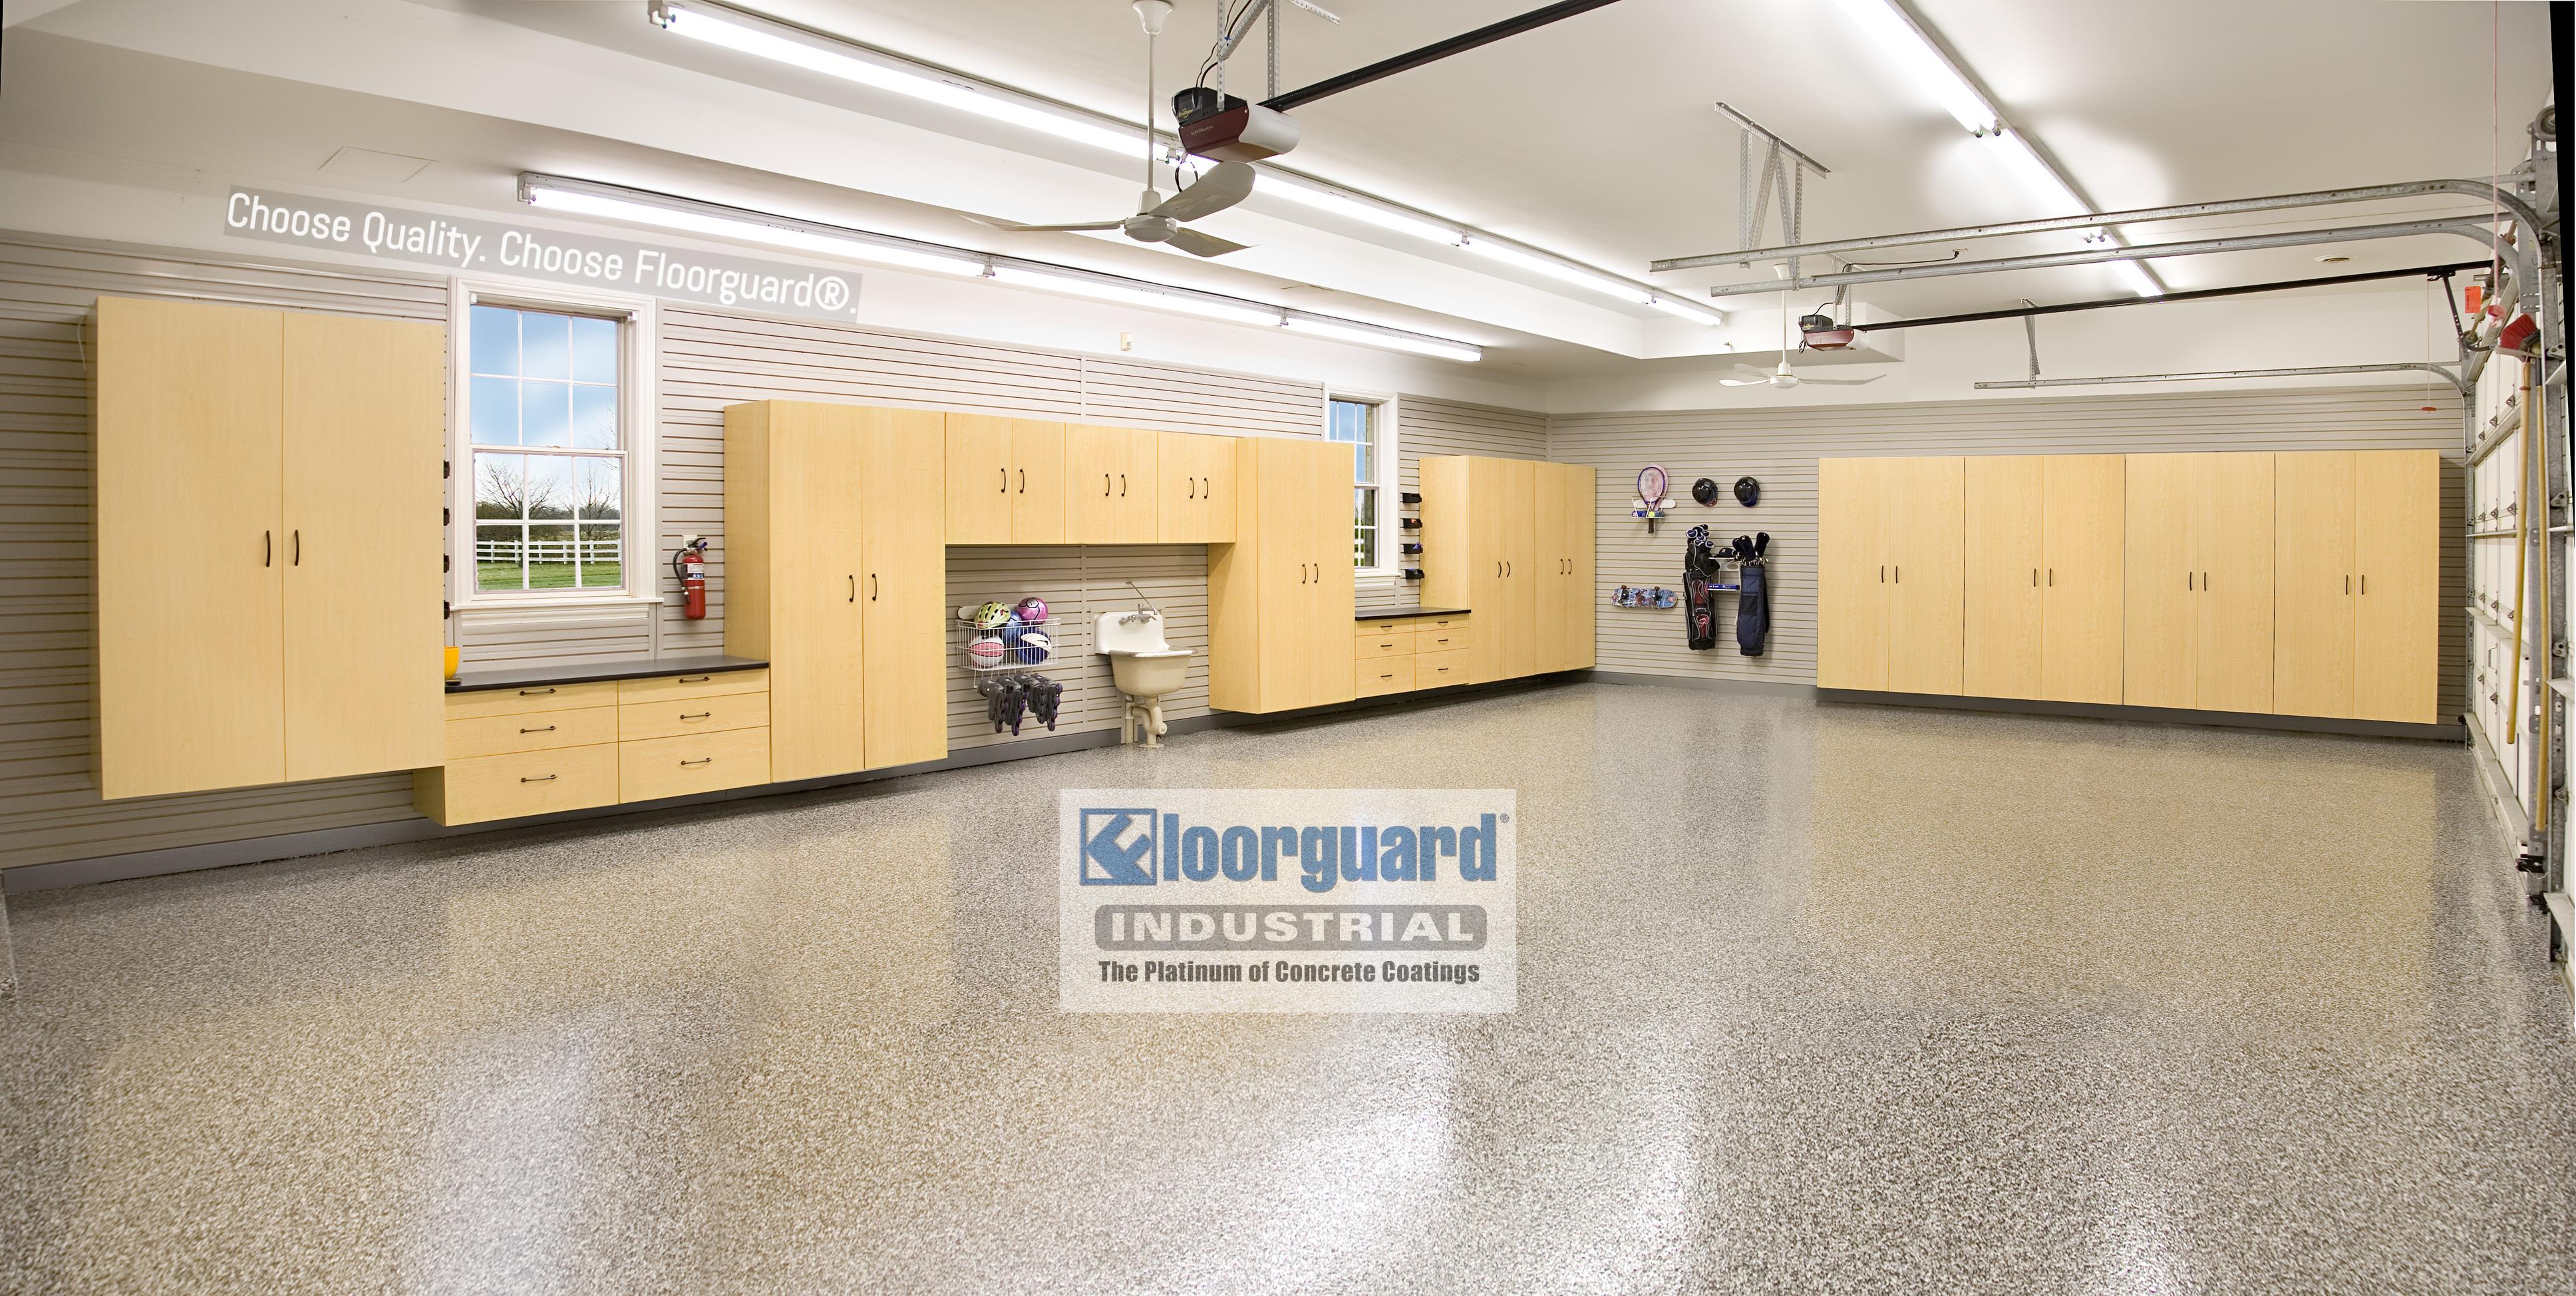 Gallery Floorguard Epoxy Flooring